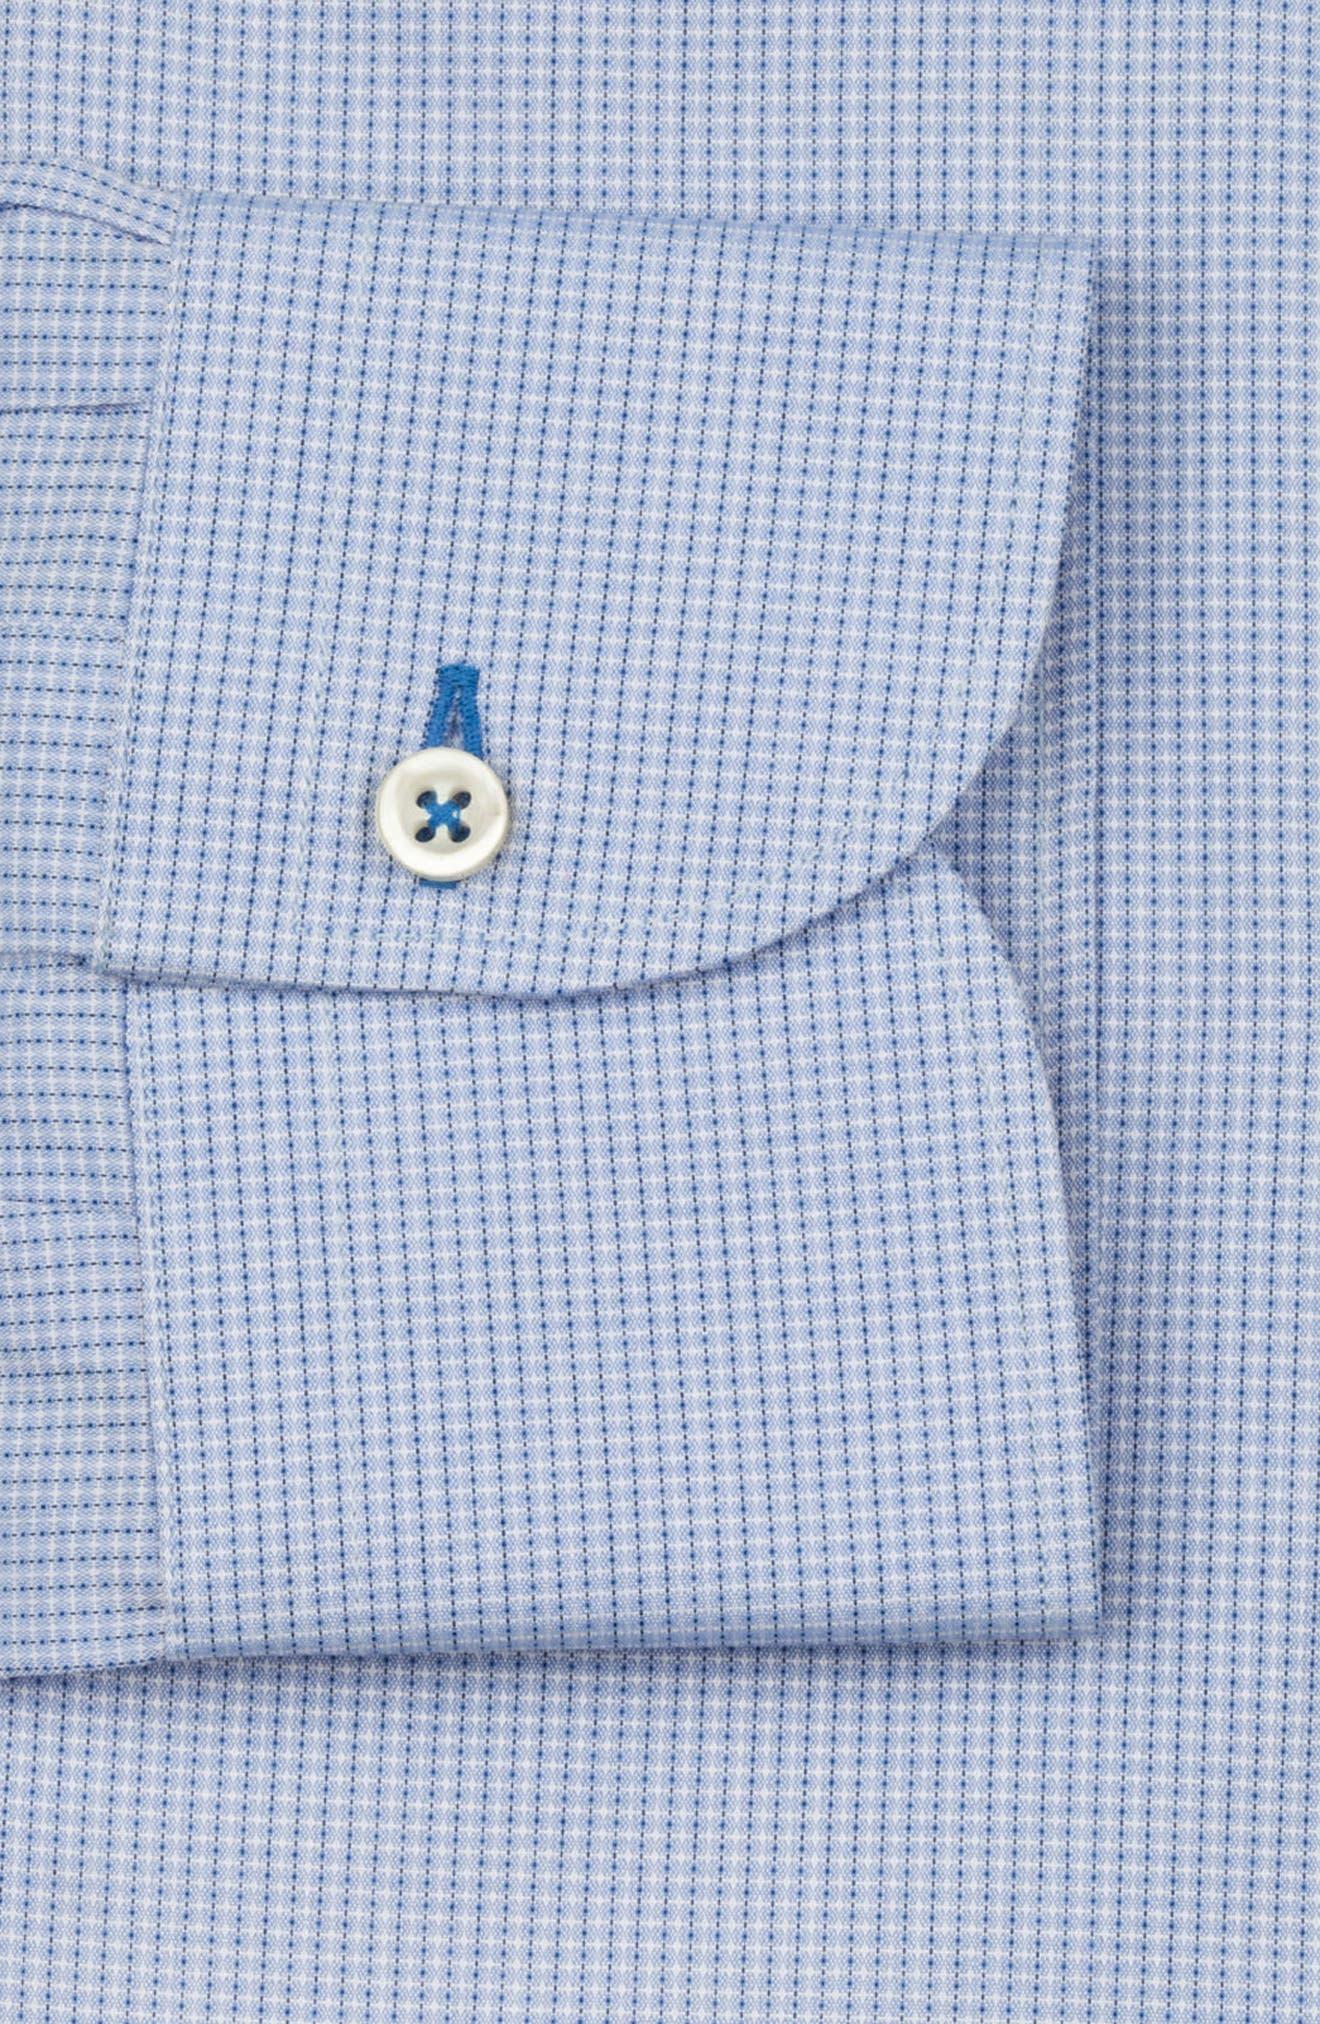 Regular Fit Solid Dress Shirt,                             Alternate thumbnail 6, color,                             LIGHT BLUE